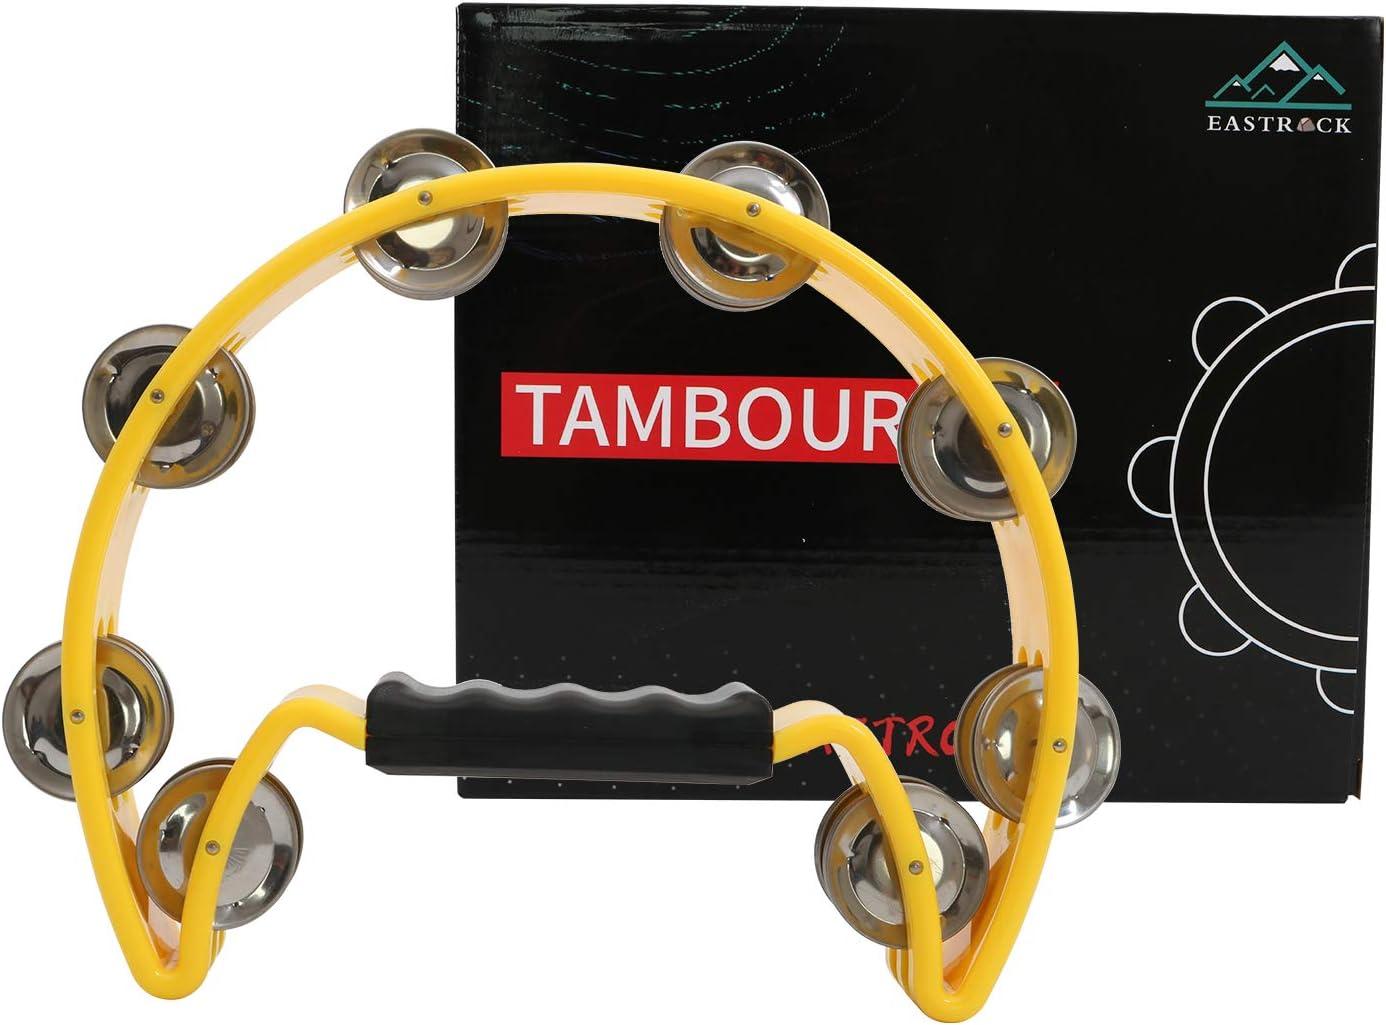 EastRock Tambourine,Metal Jingles Hand Held Percussion-Half Moon Tambourine for Kids Adults Party BLACK KTV